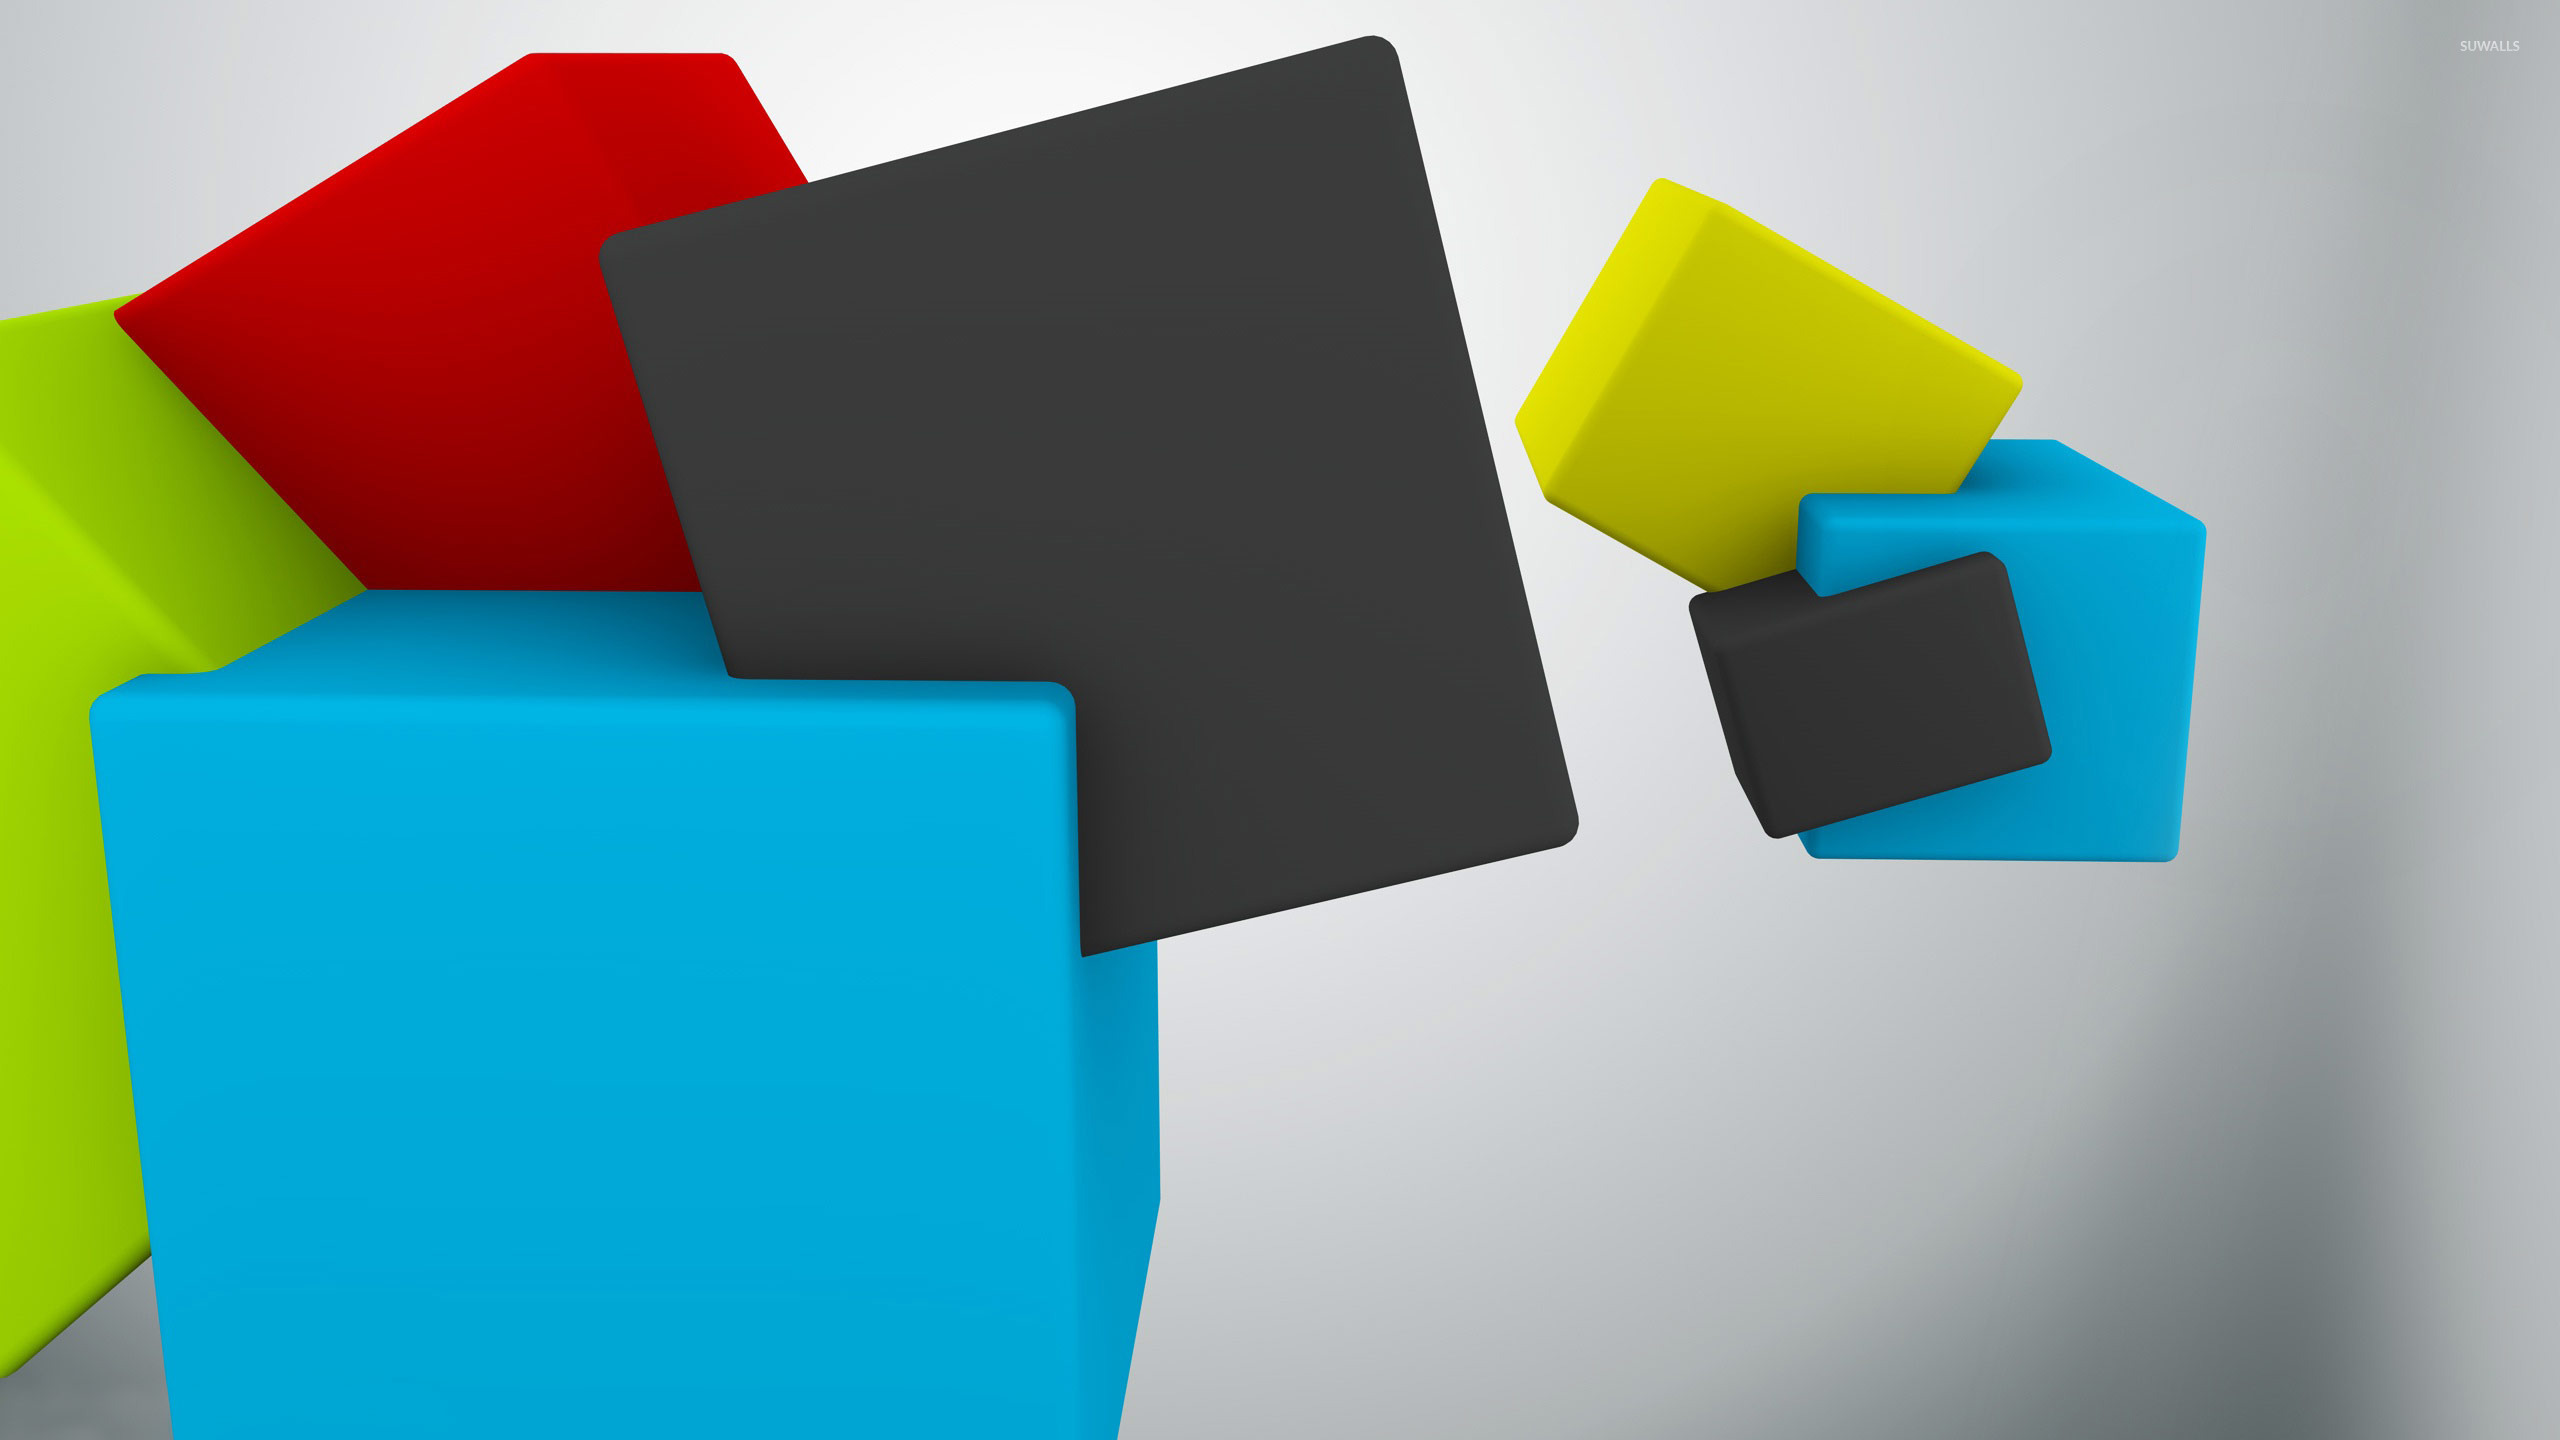 Кубики  № 2315773 без смс